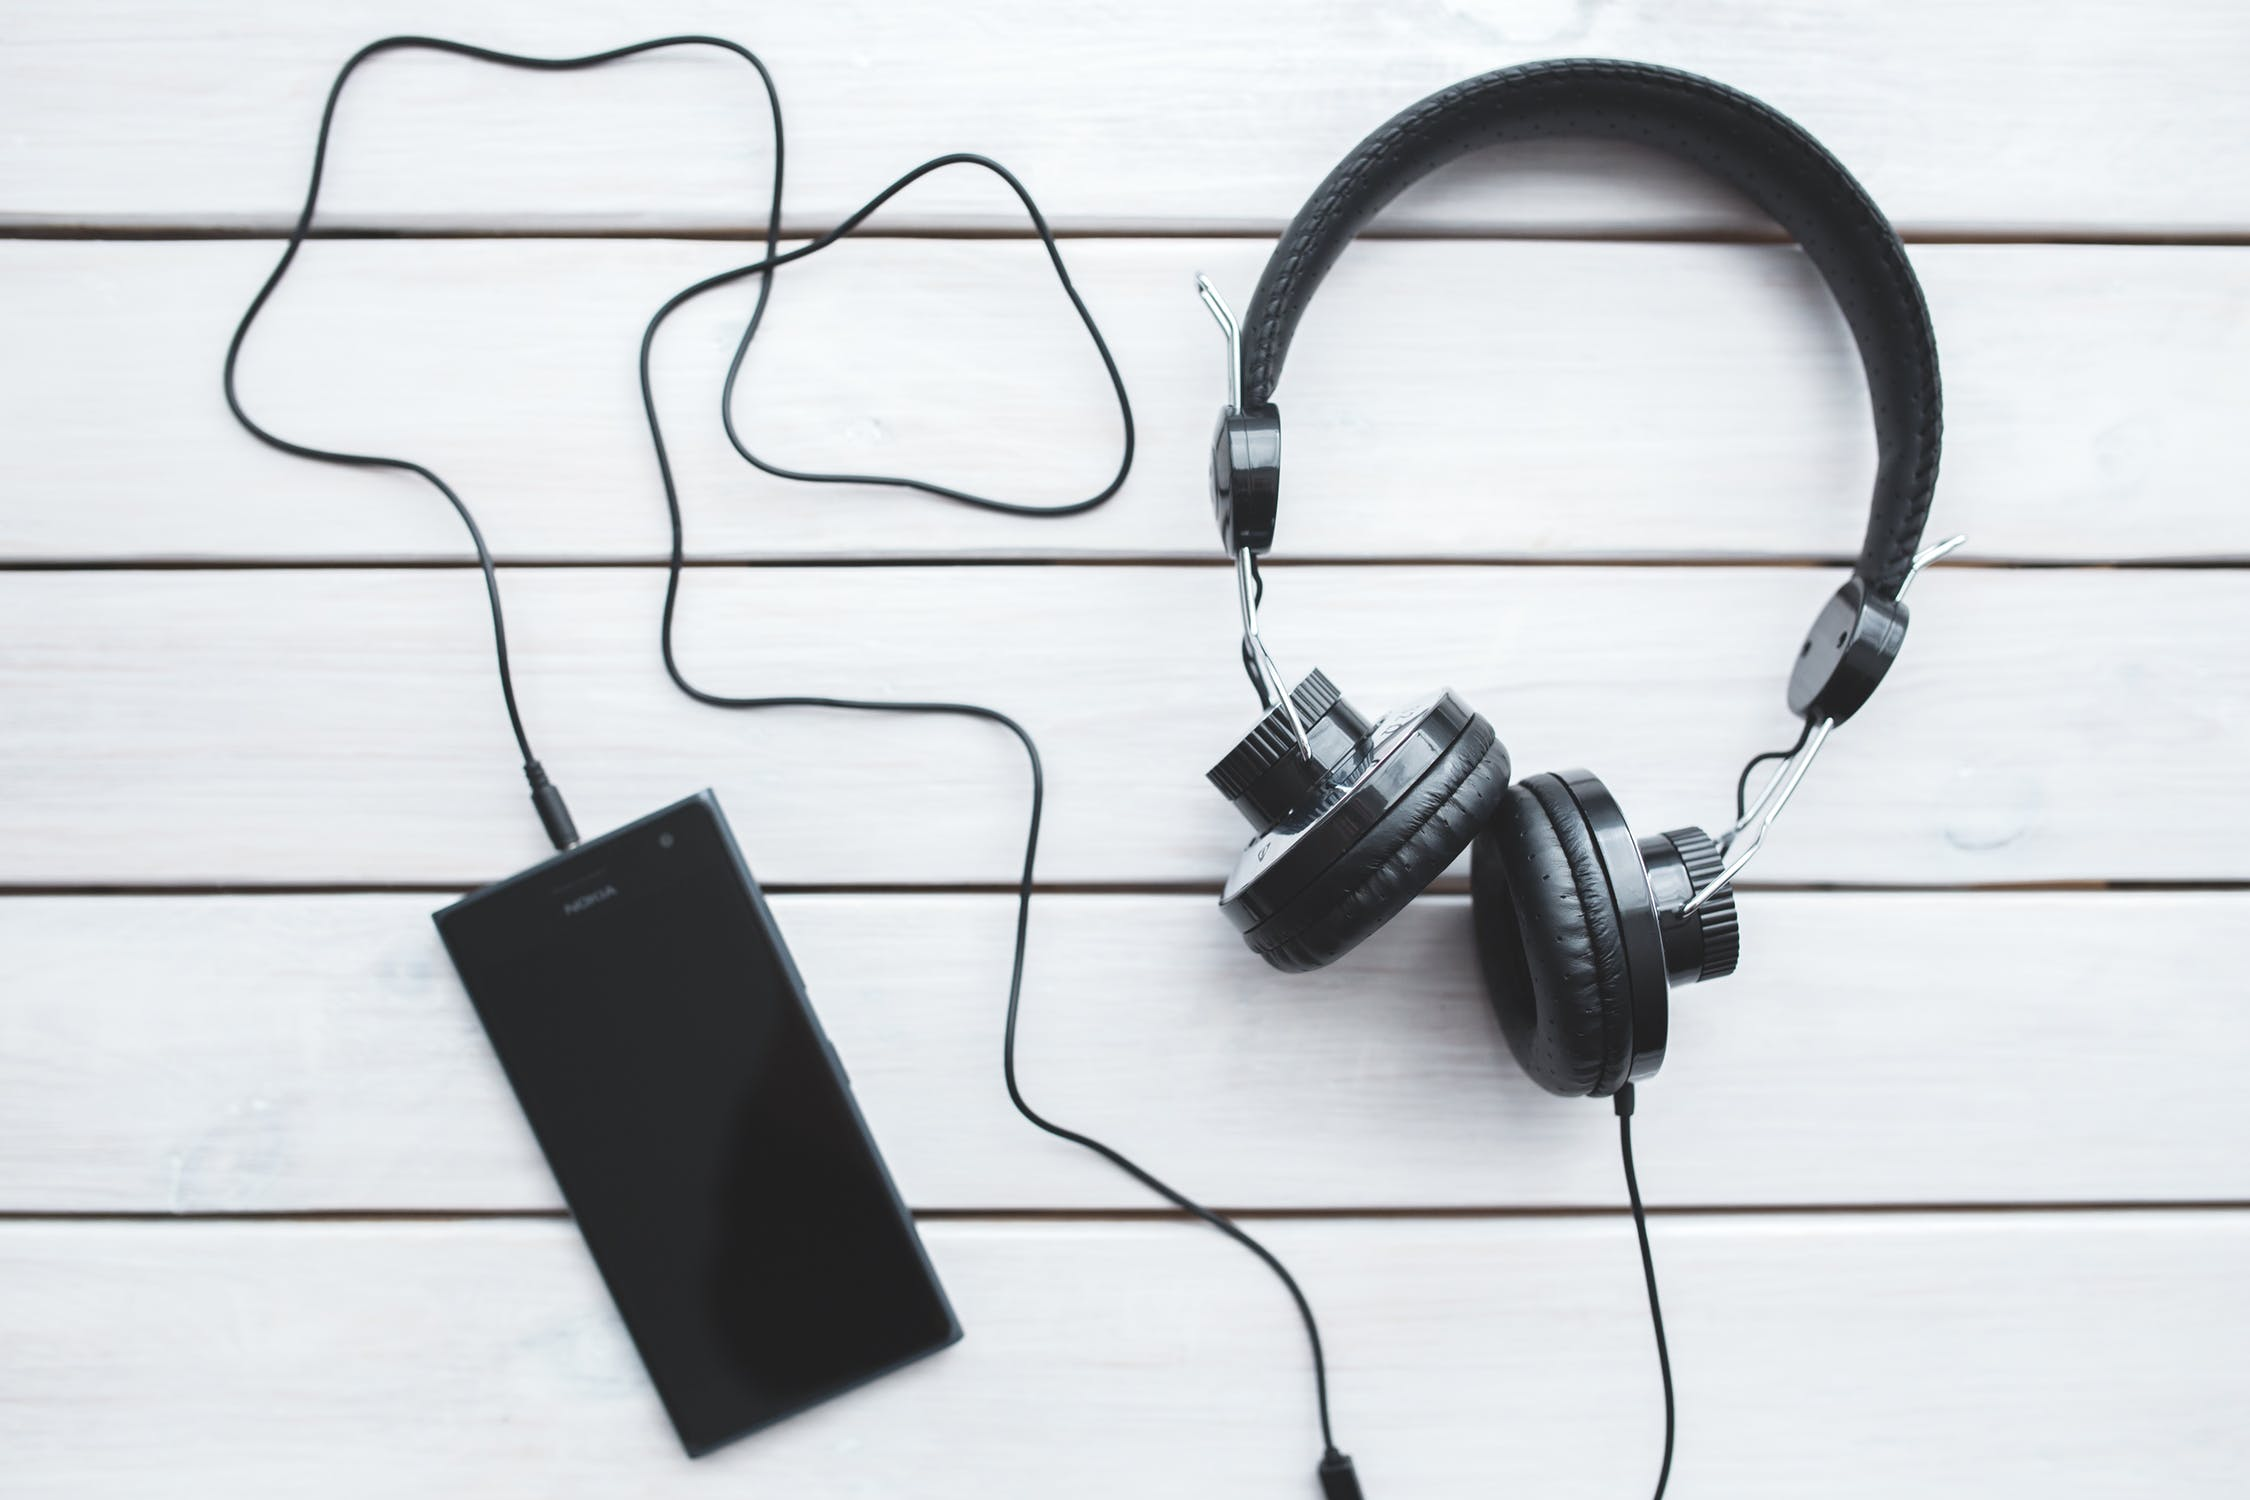 image of headphones